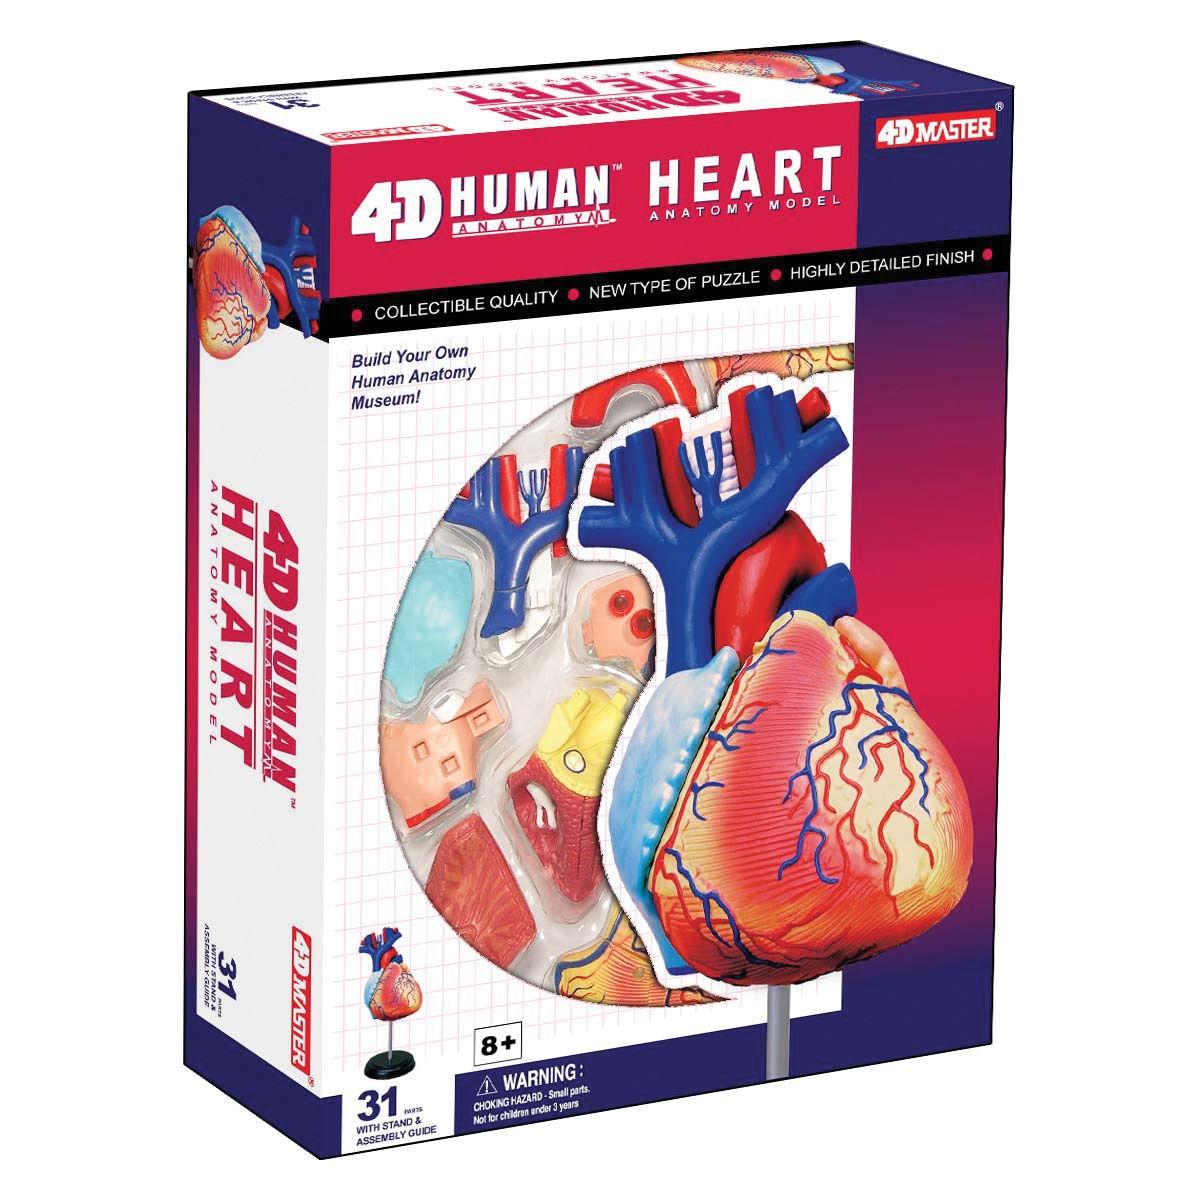 4d Vision Human Heart Anatomy Model